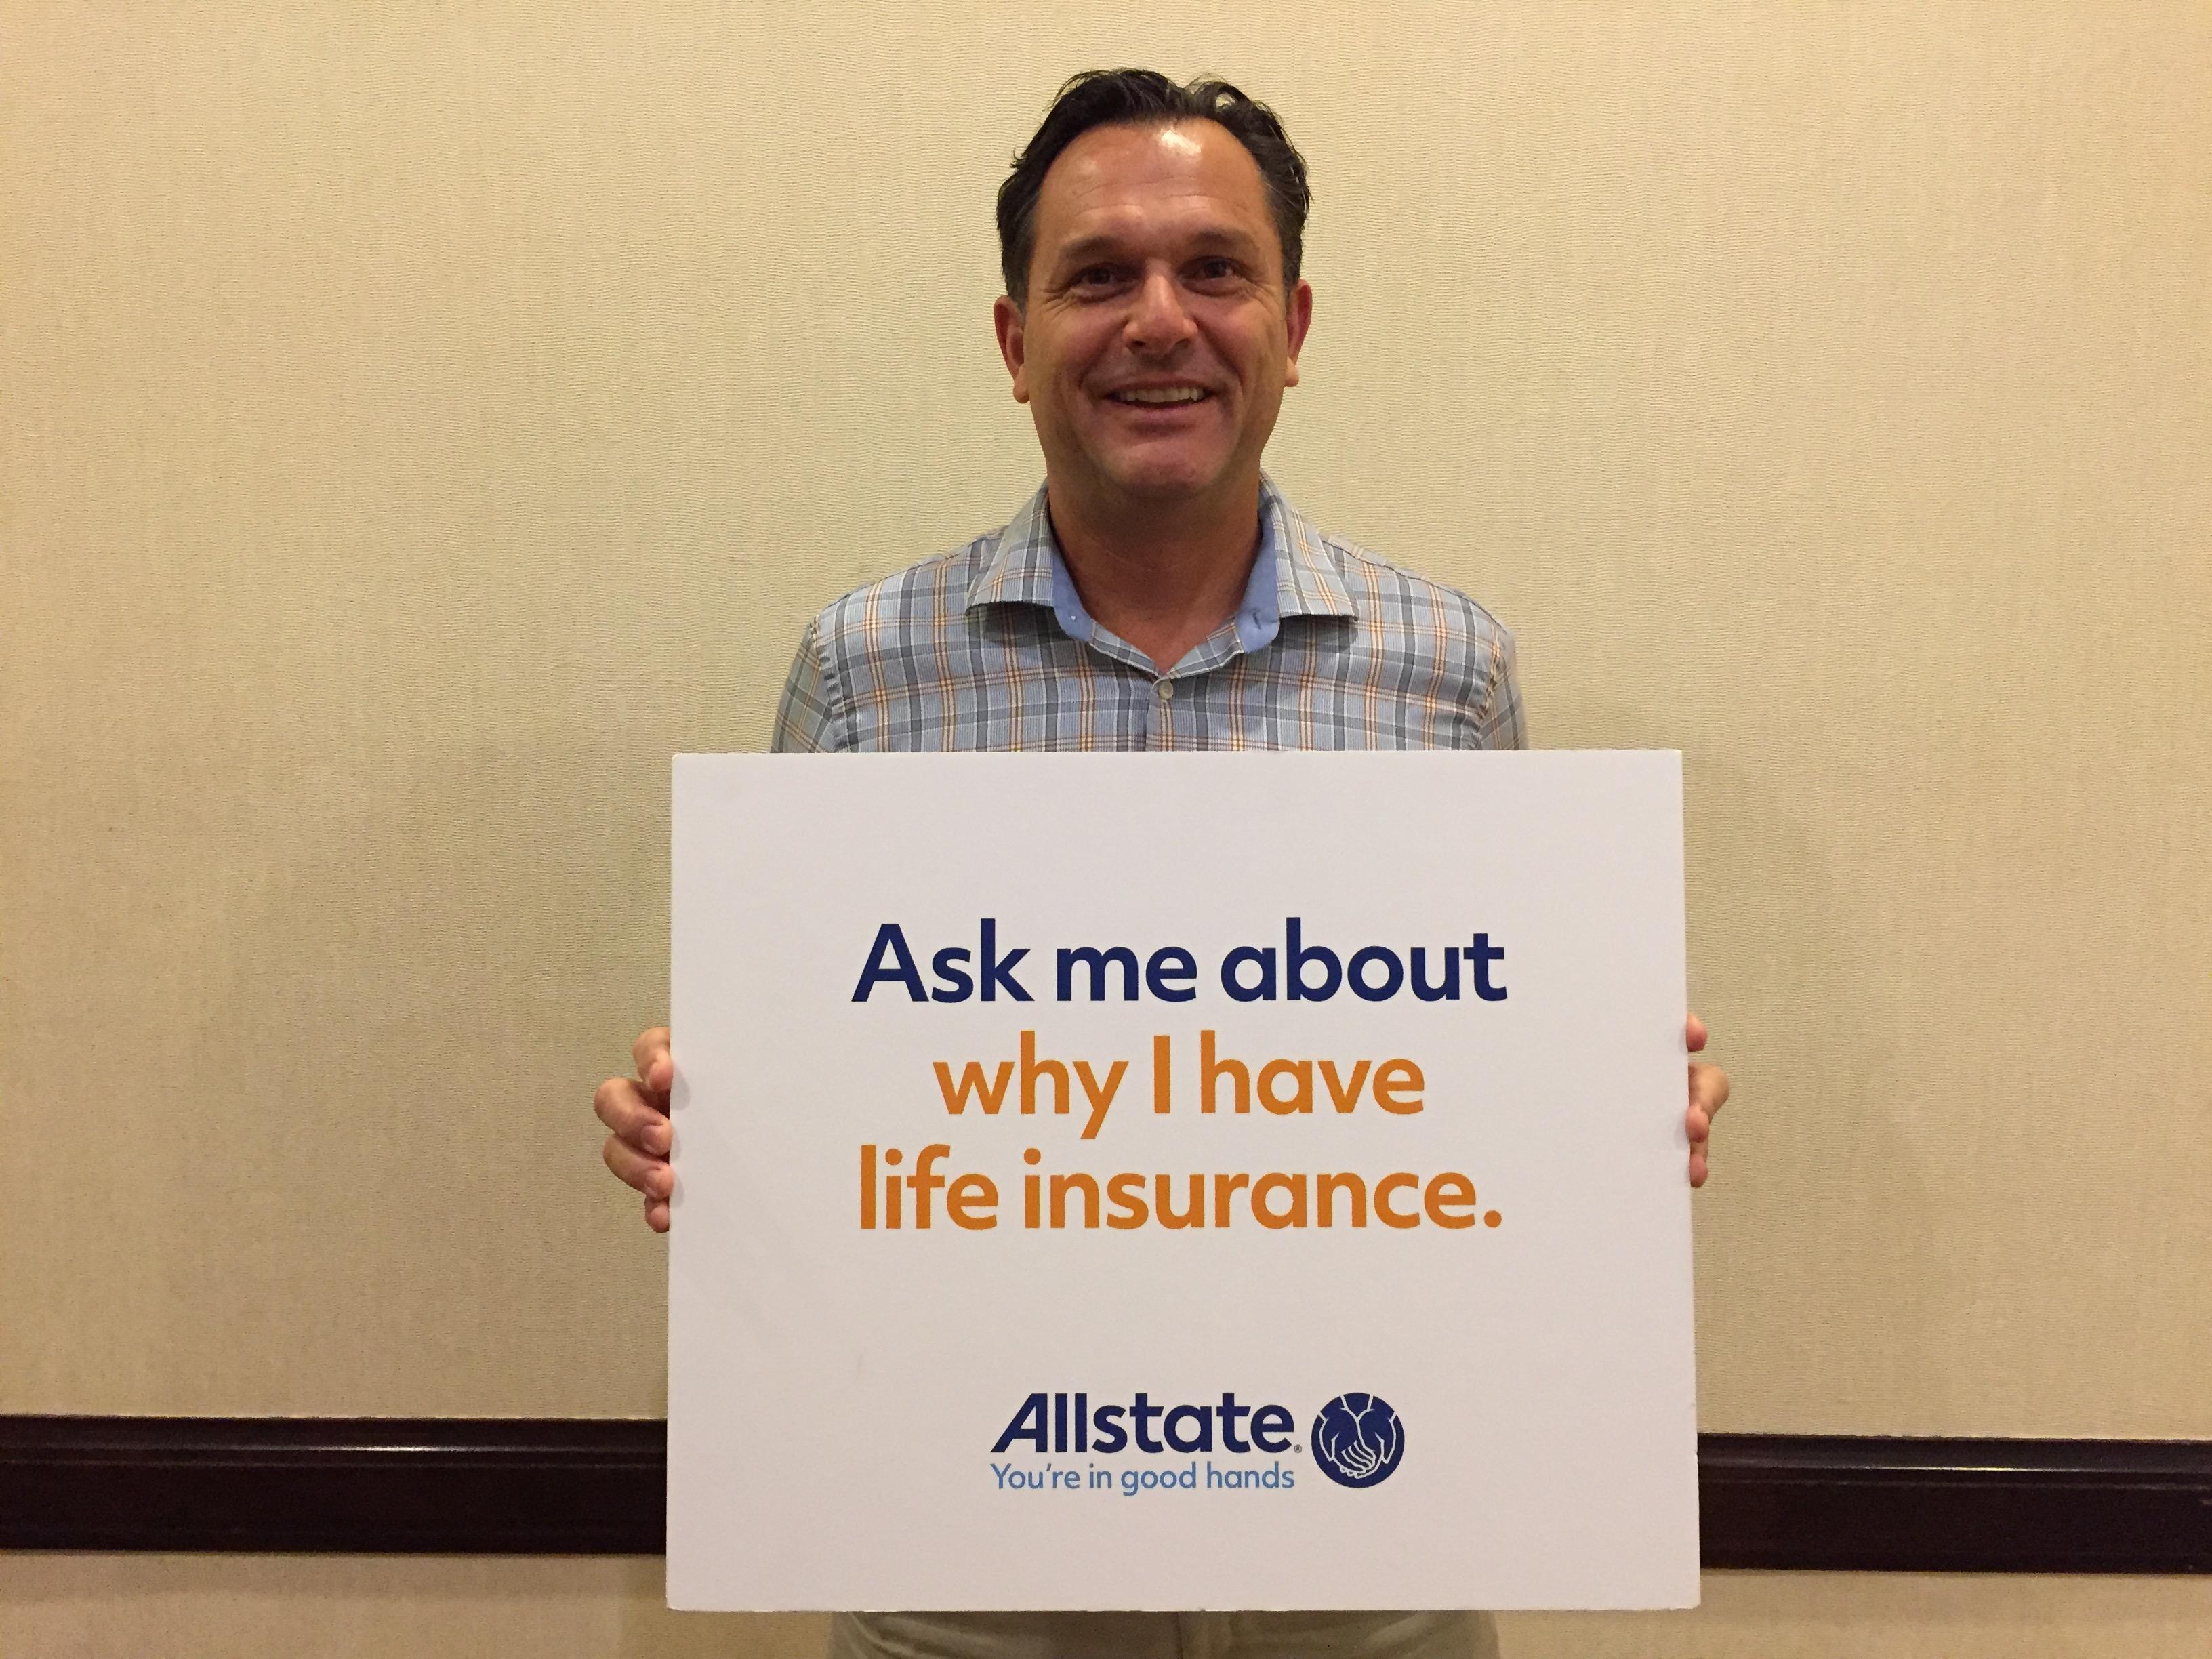 Todd Gentile: Allstate Insurance image 9